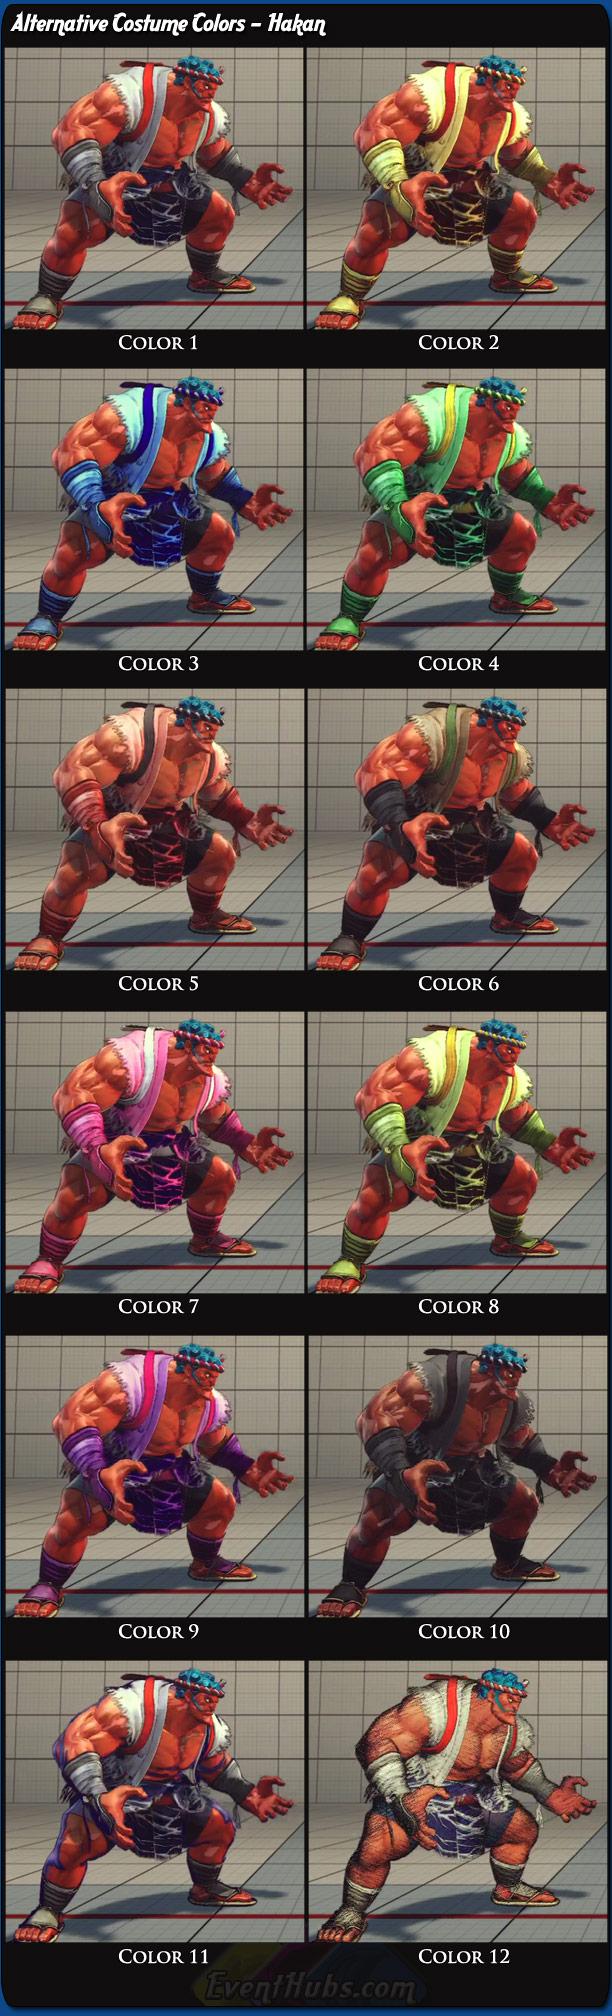 Hakan's alternative costume colors for Super Street Fighter 4